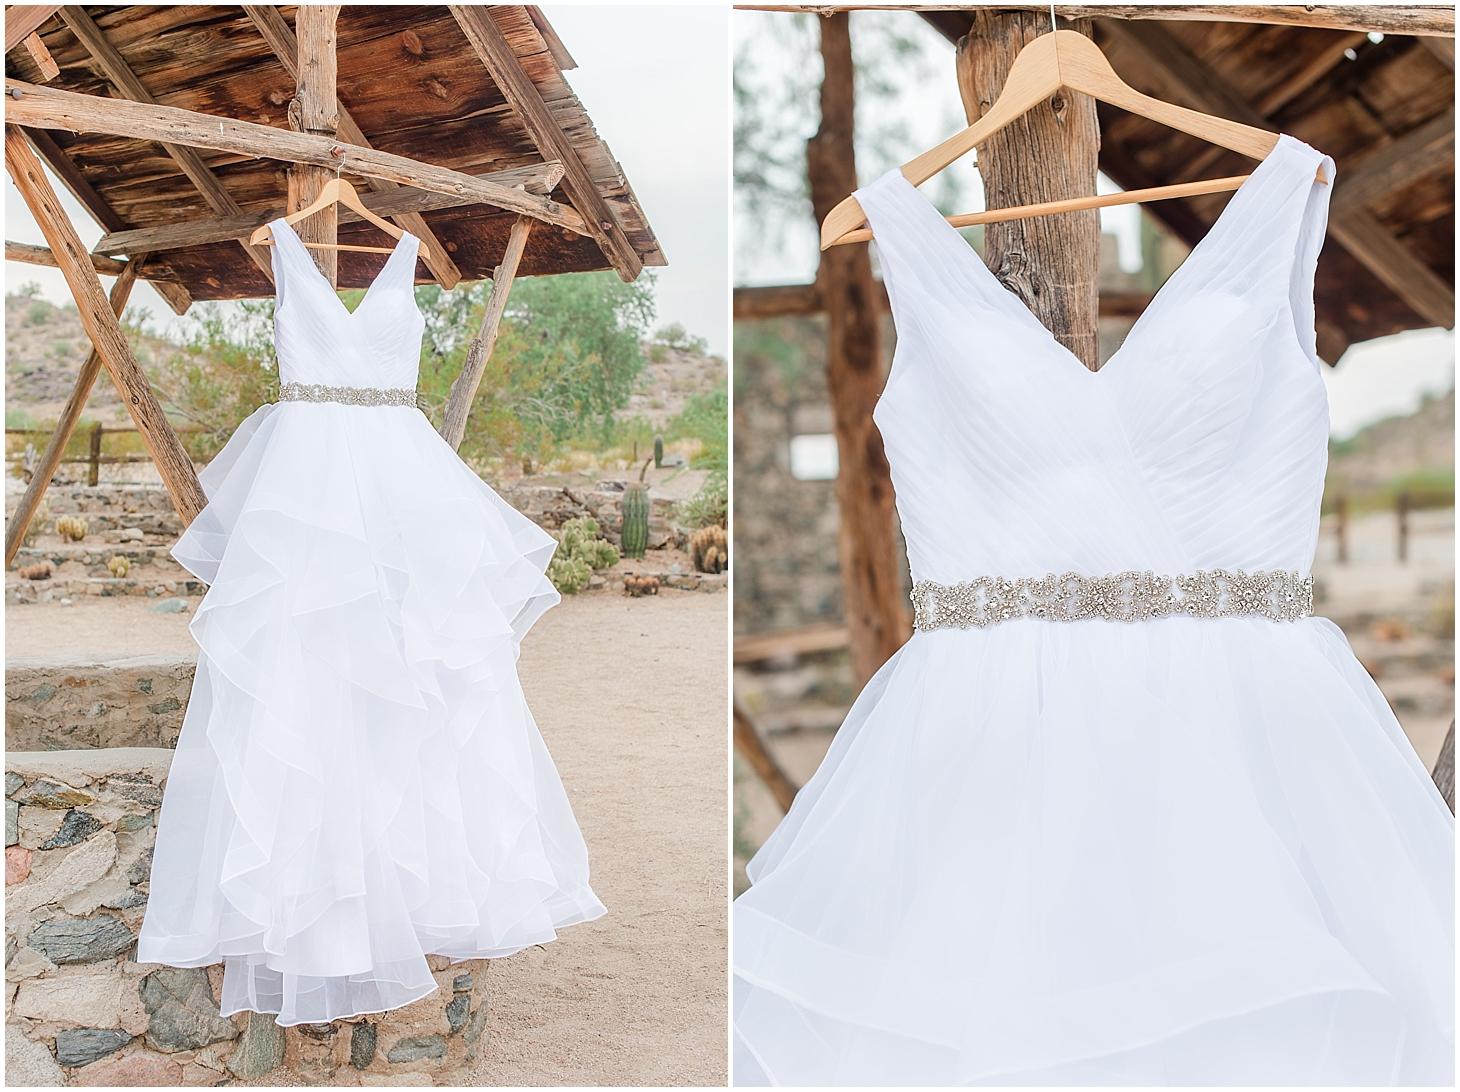 Amazing wedding dress photographed at Scorpion Gulch in Phoenix! Photos taken by Phoenix wedding photographer, Jade Min Photography.